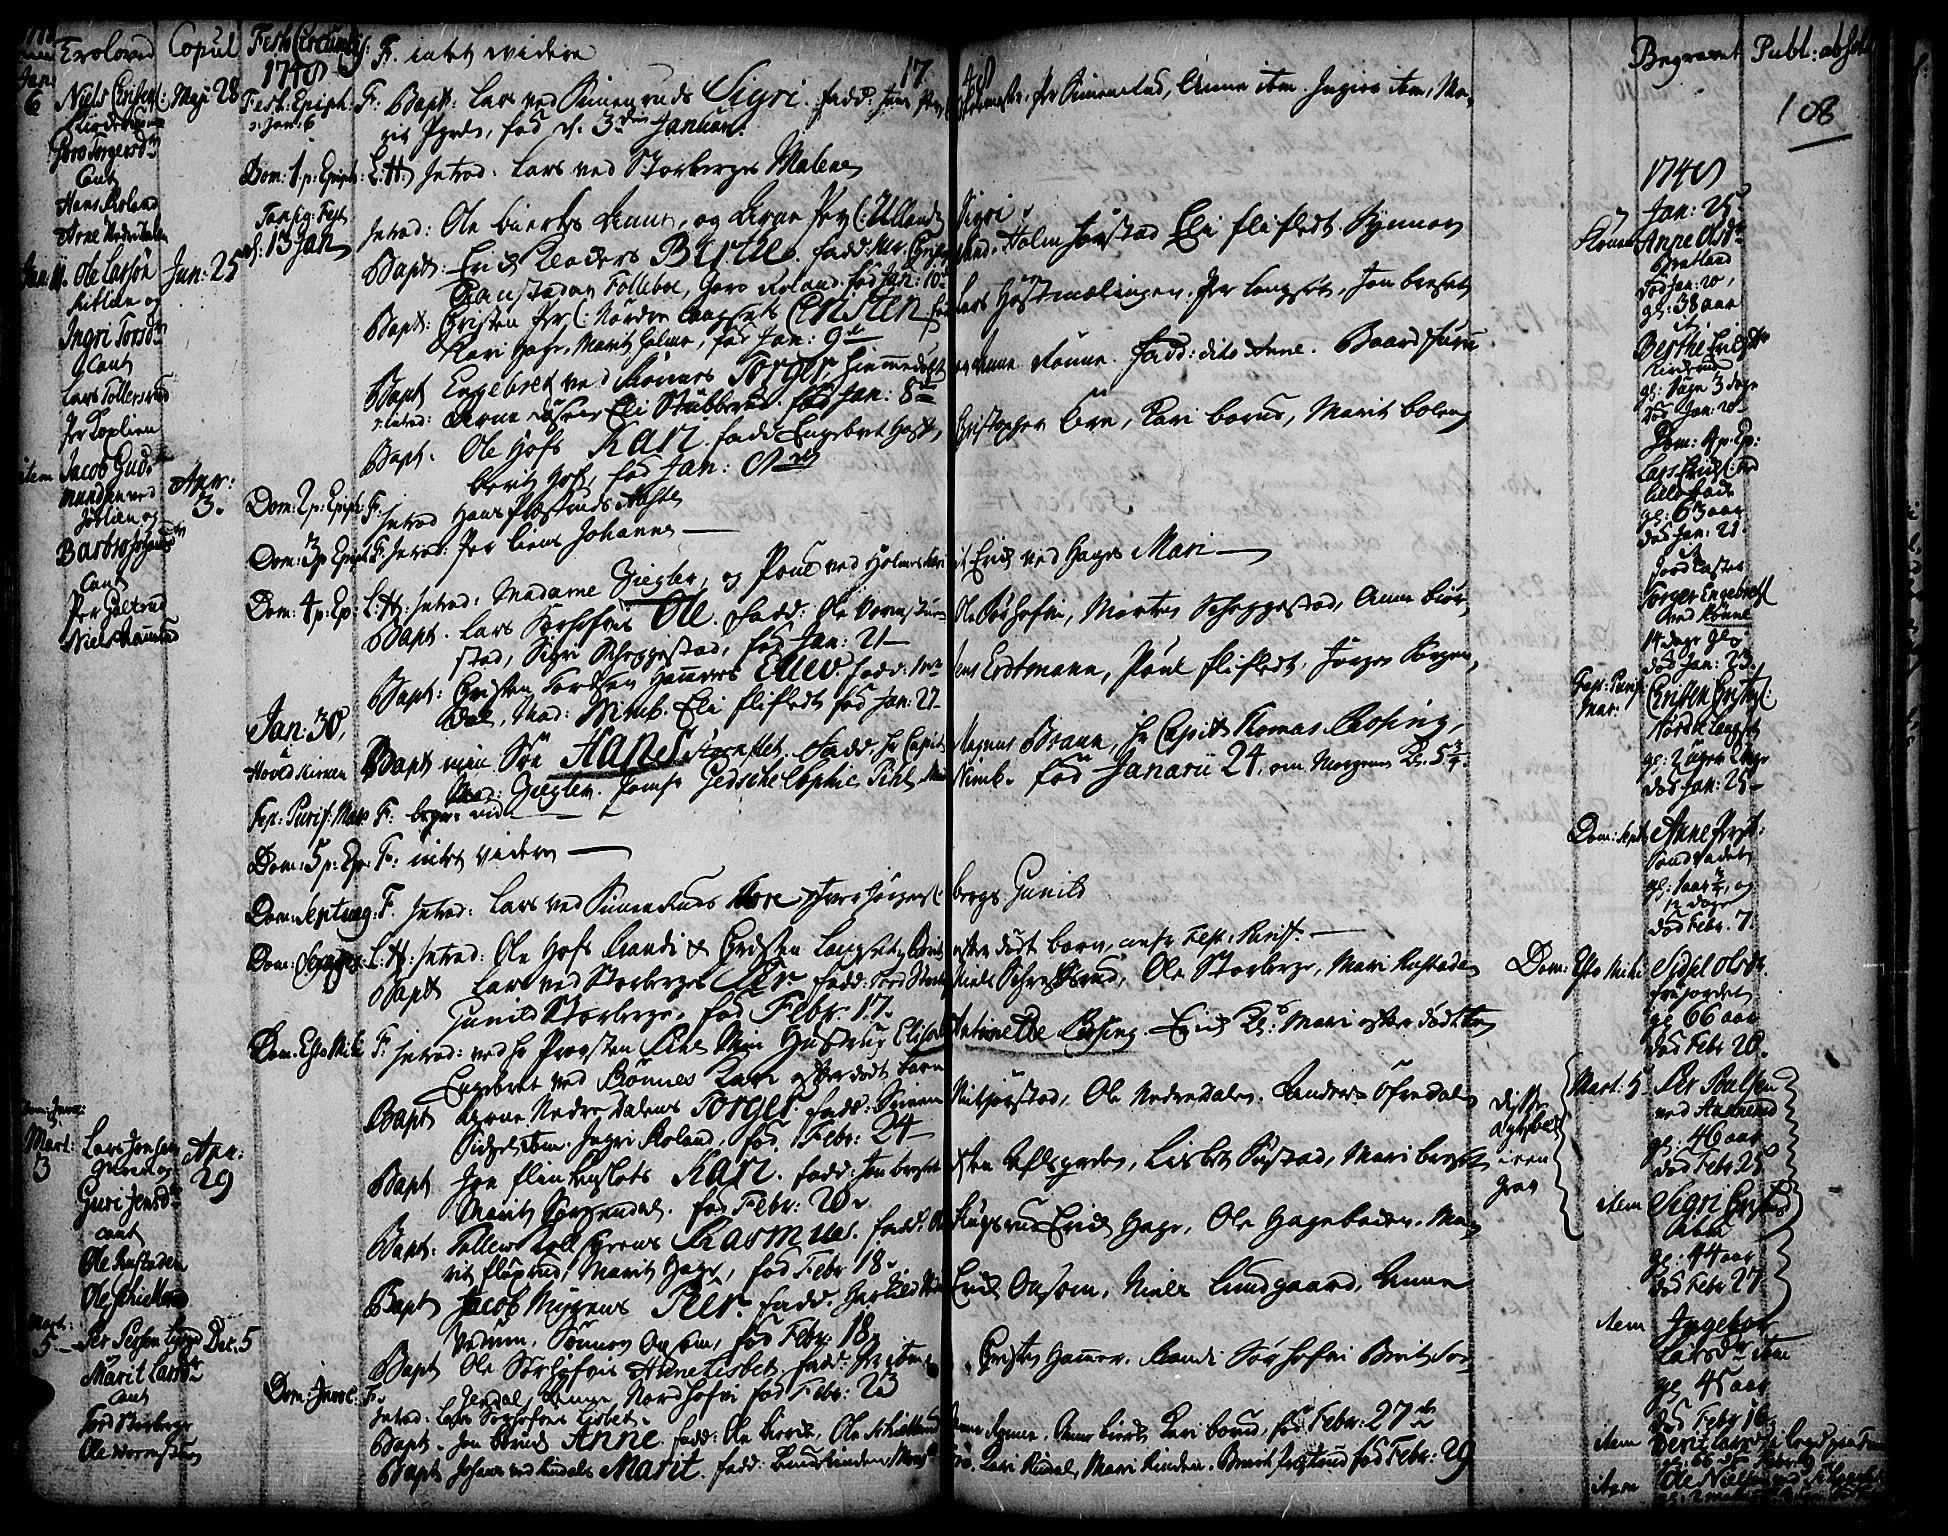 SAH, Fåberg prestekontor, Ministerialbok nr. 1, 1727-1775, s. 108